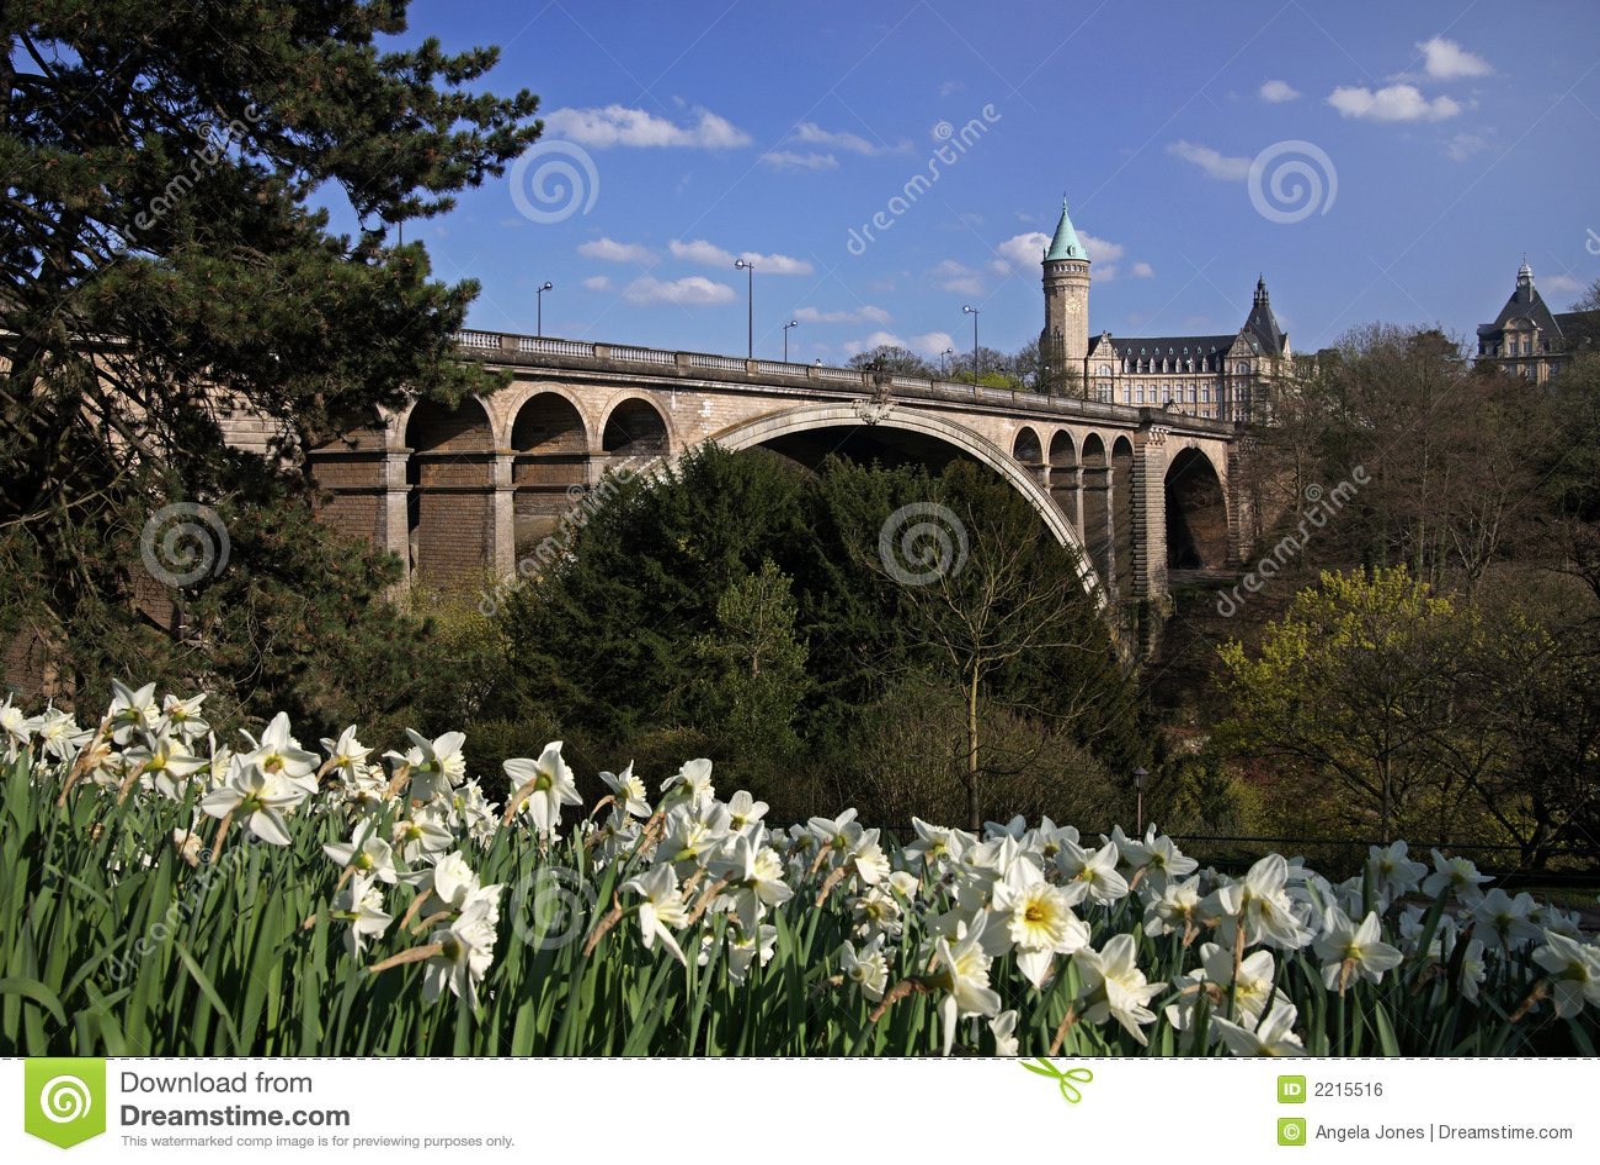 pont adolphe bridge luxembourg royalty free stock image image 2215516. Black Bedroom Furniture Sets. Home Design Ideas